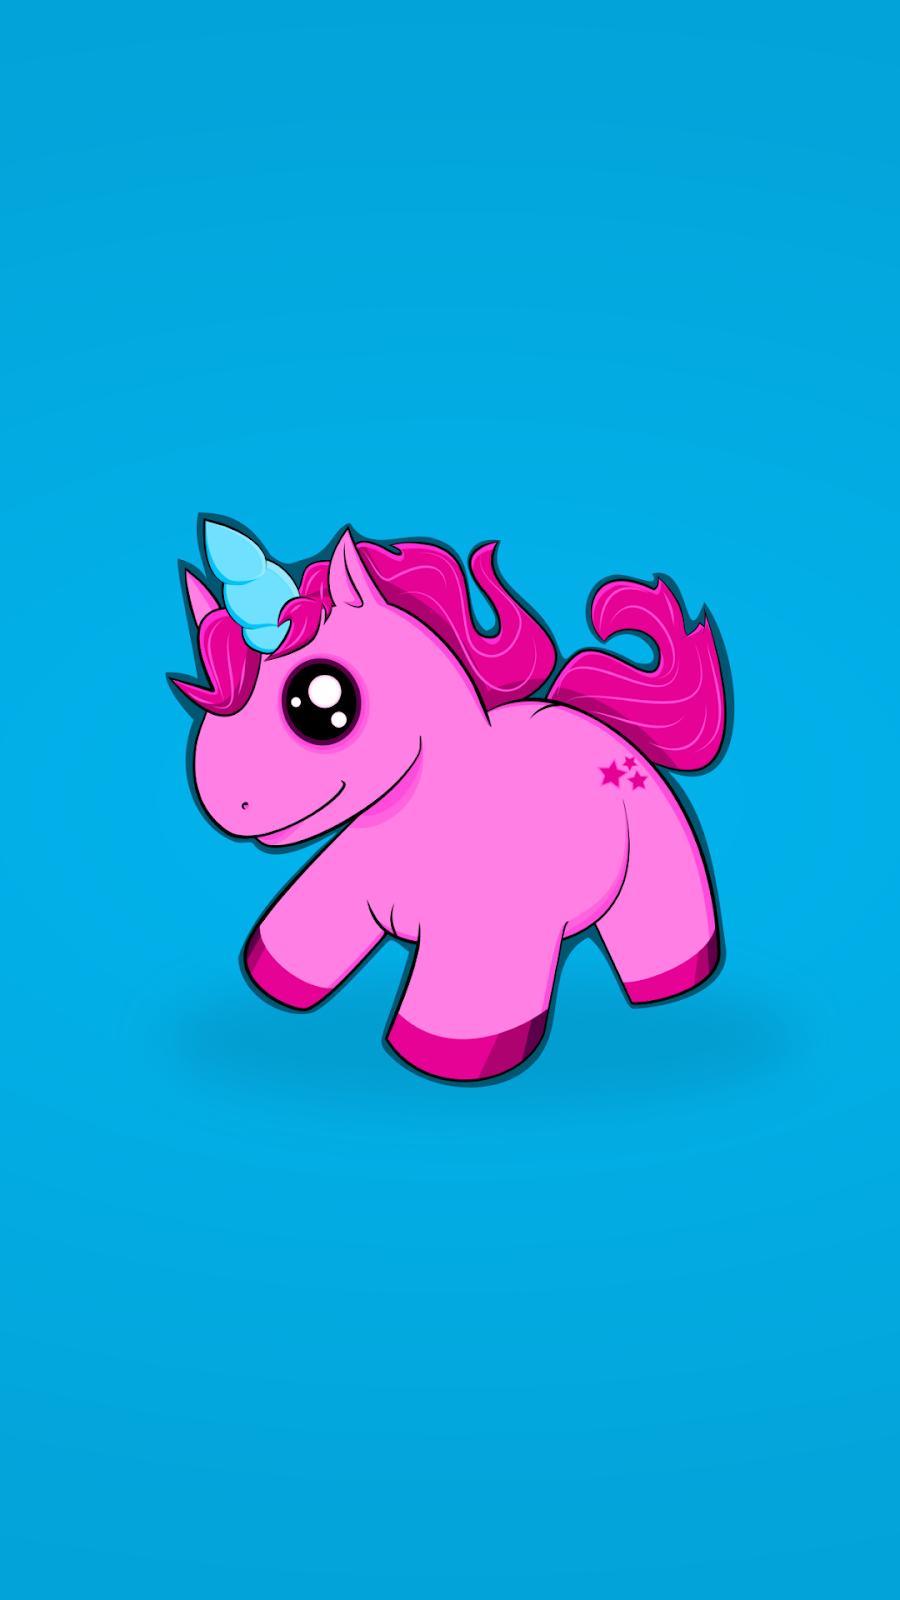 #aesthetic #pink #wallpaper #unicorn